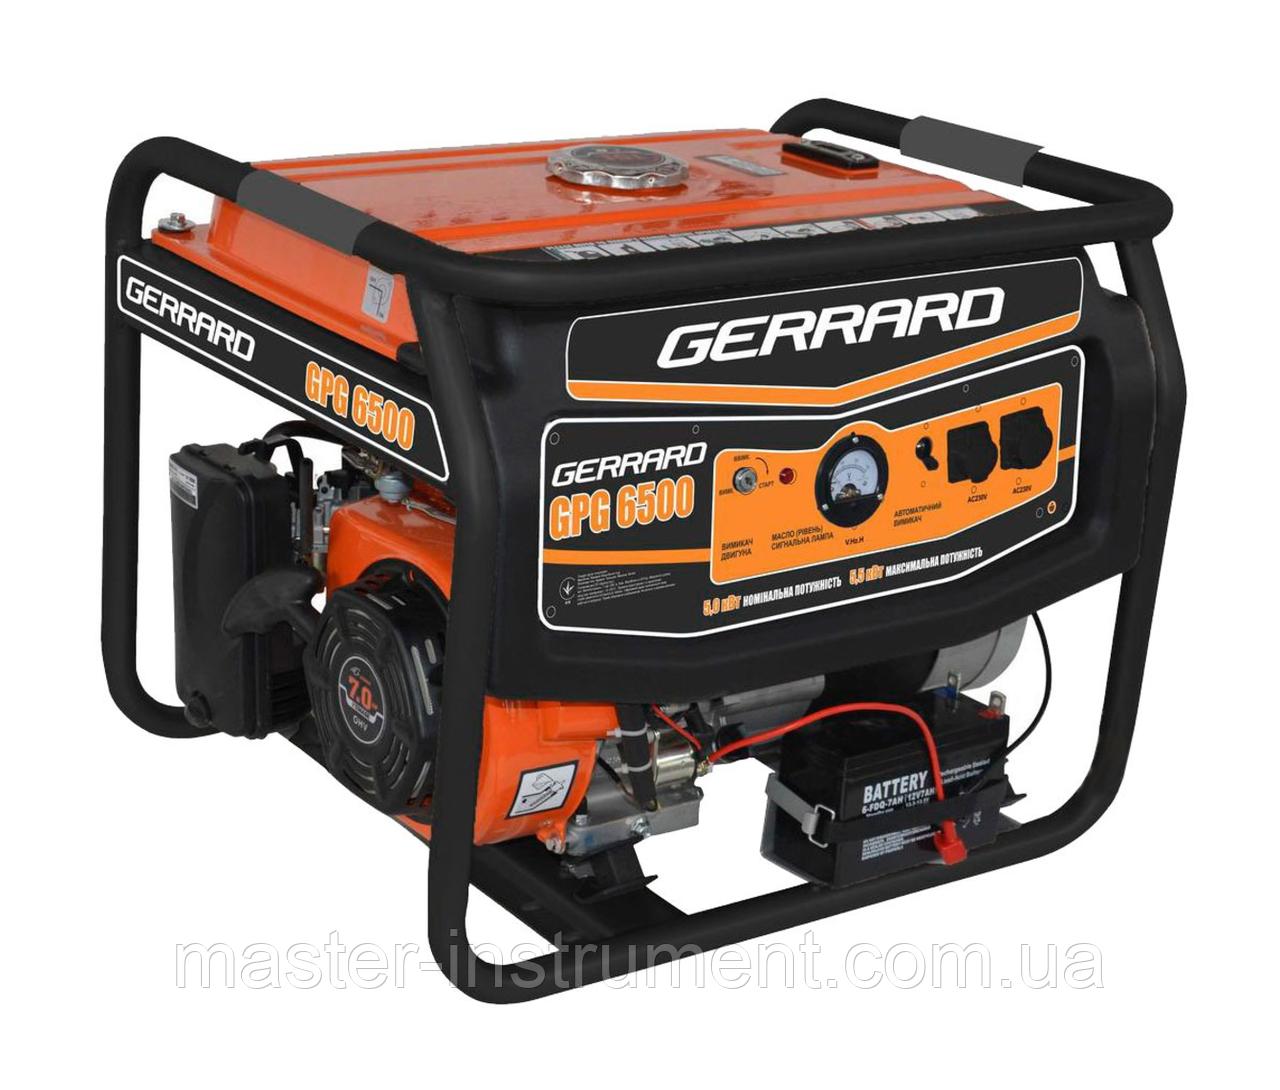 Электрогенератор GERRARD GPG 6500